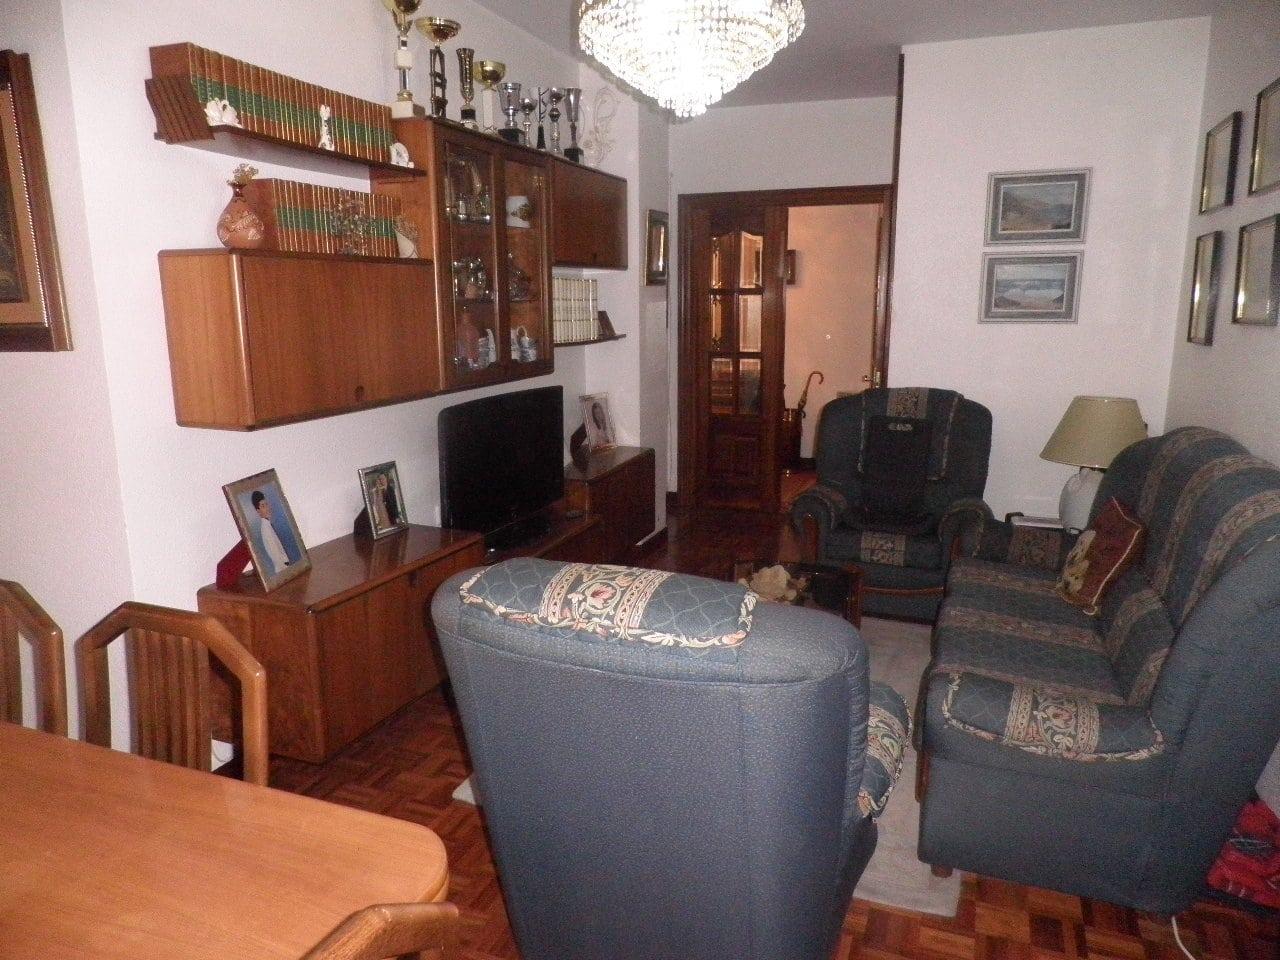 V04719-02-SALON-PISO-PINTORES-TRIVINSA-INMOBILIARIA